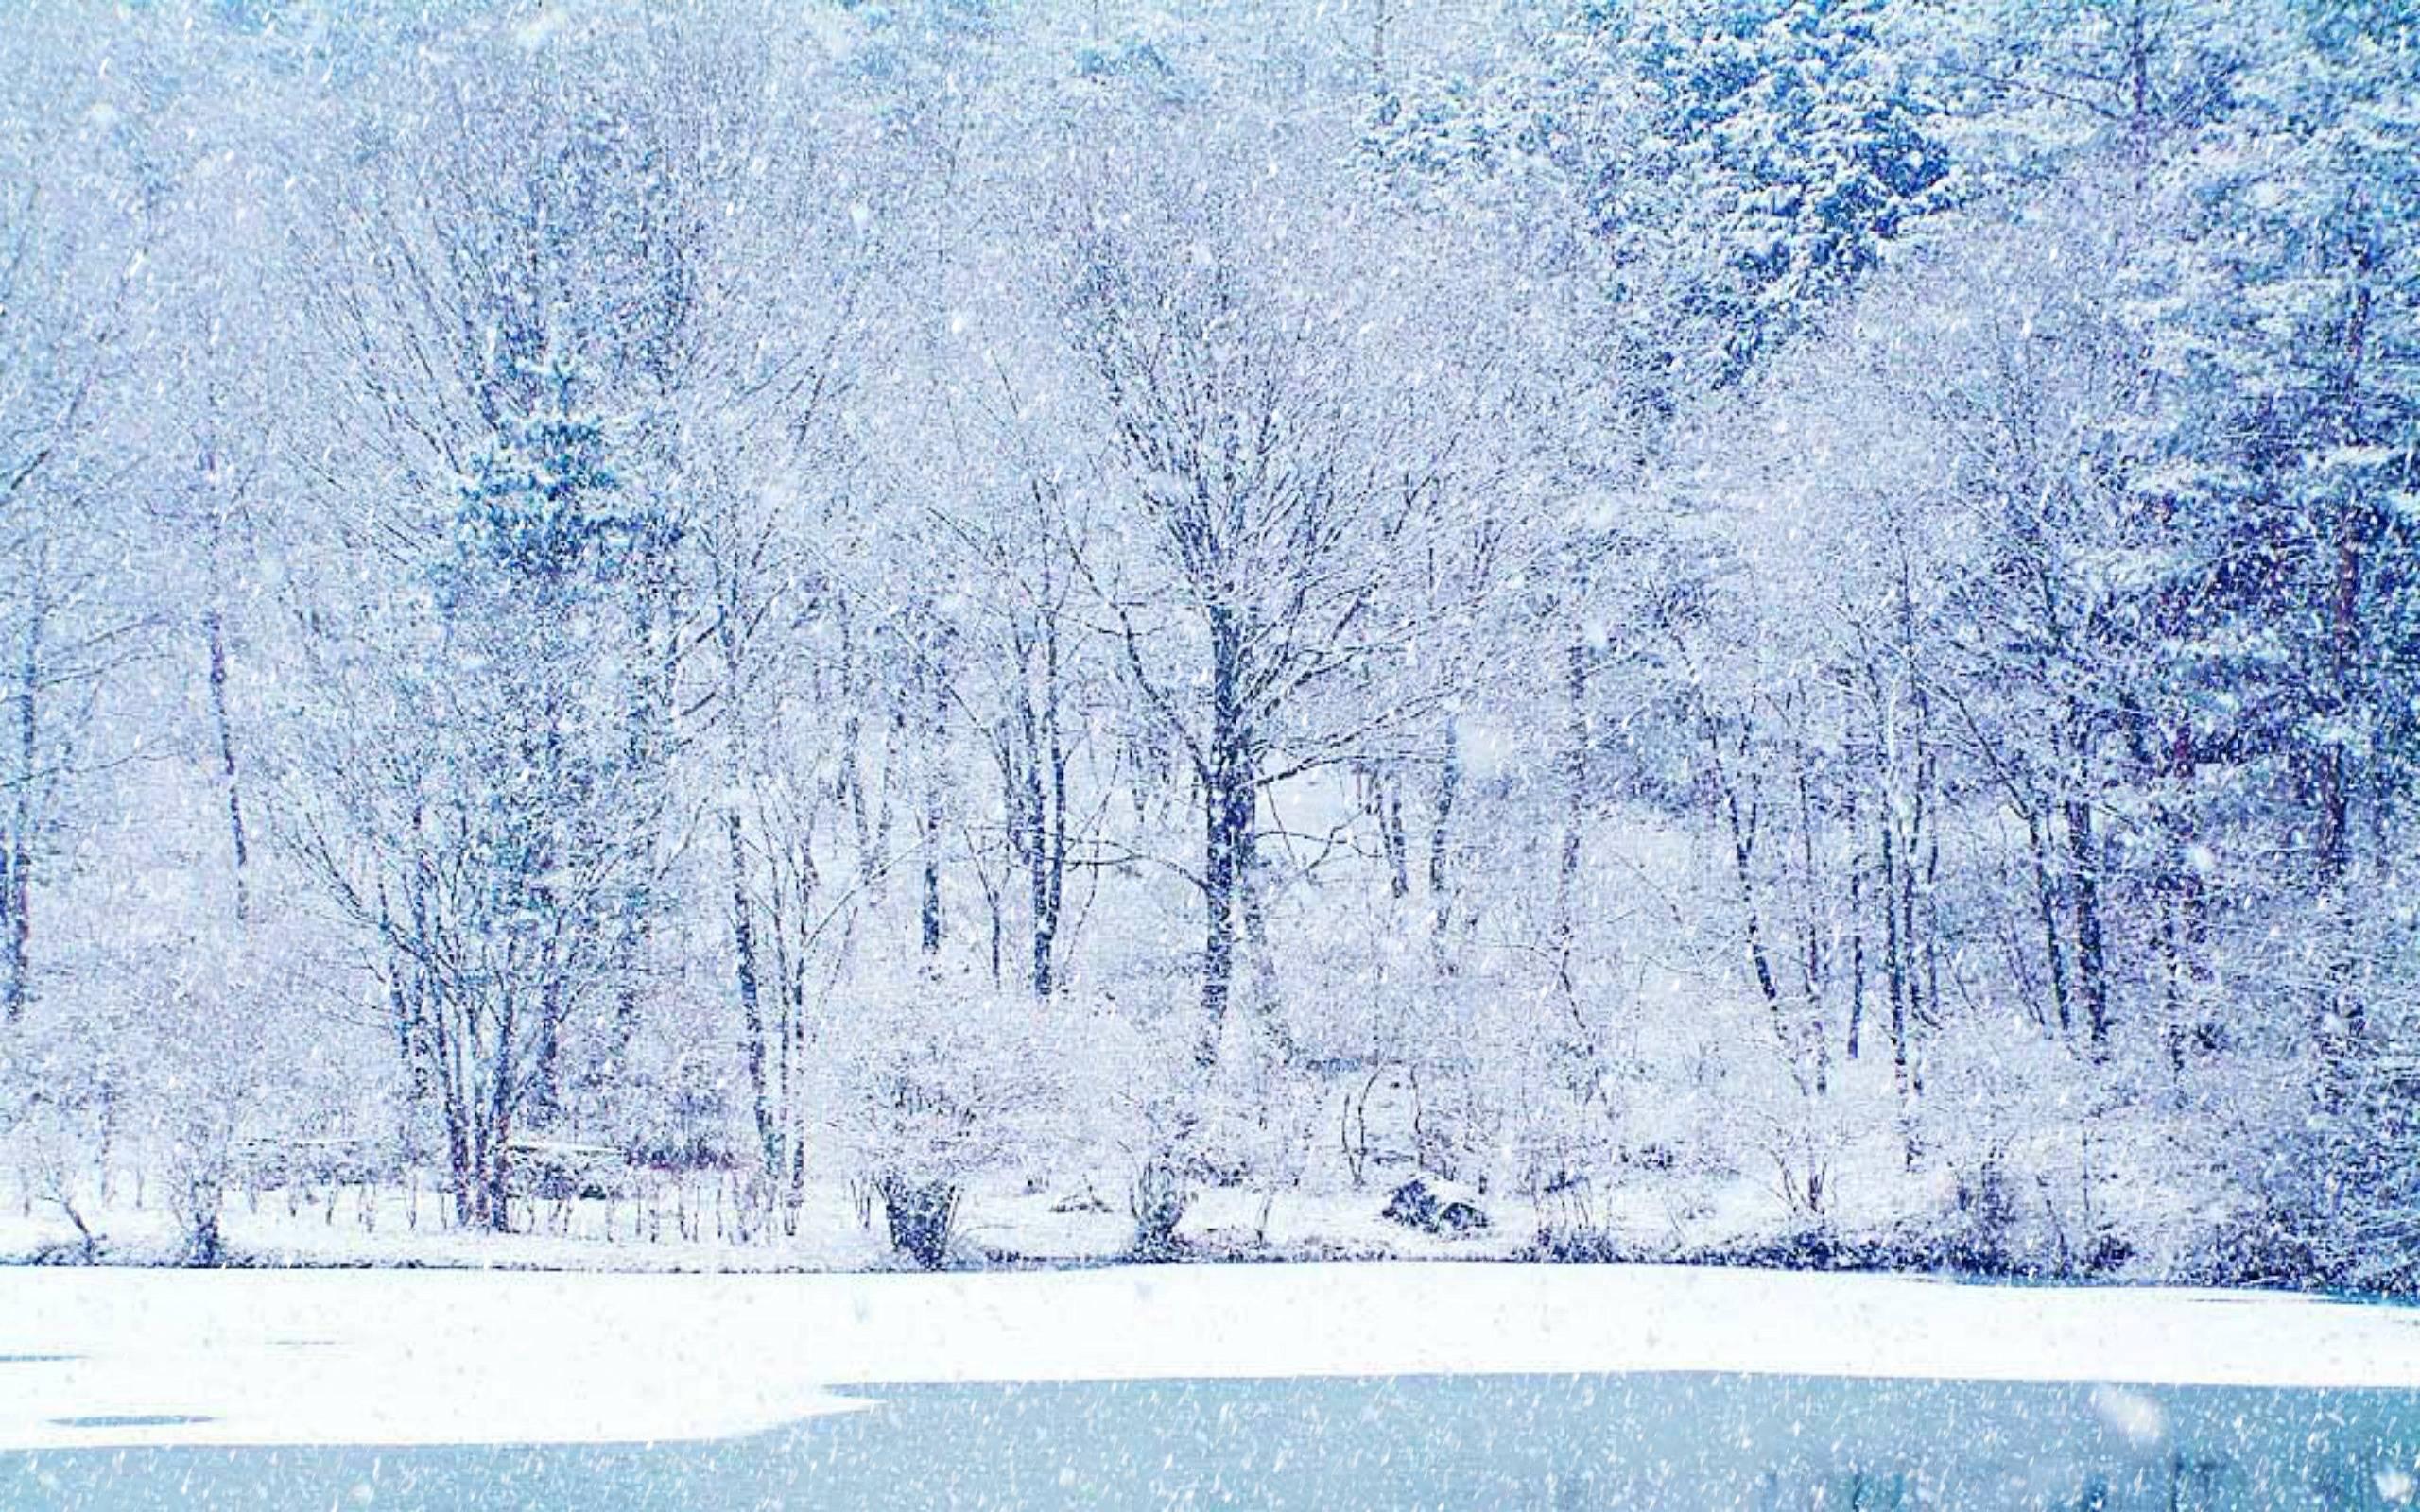 Winter Scene Backgrounds - Wallpaper Cave